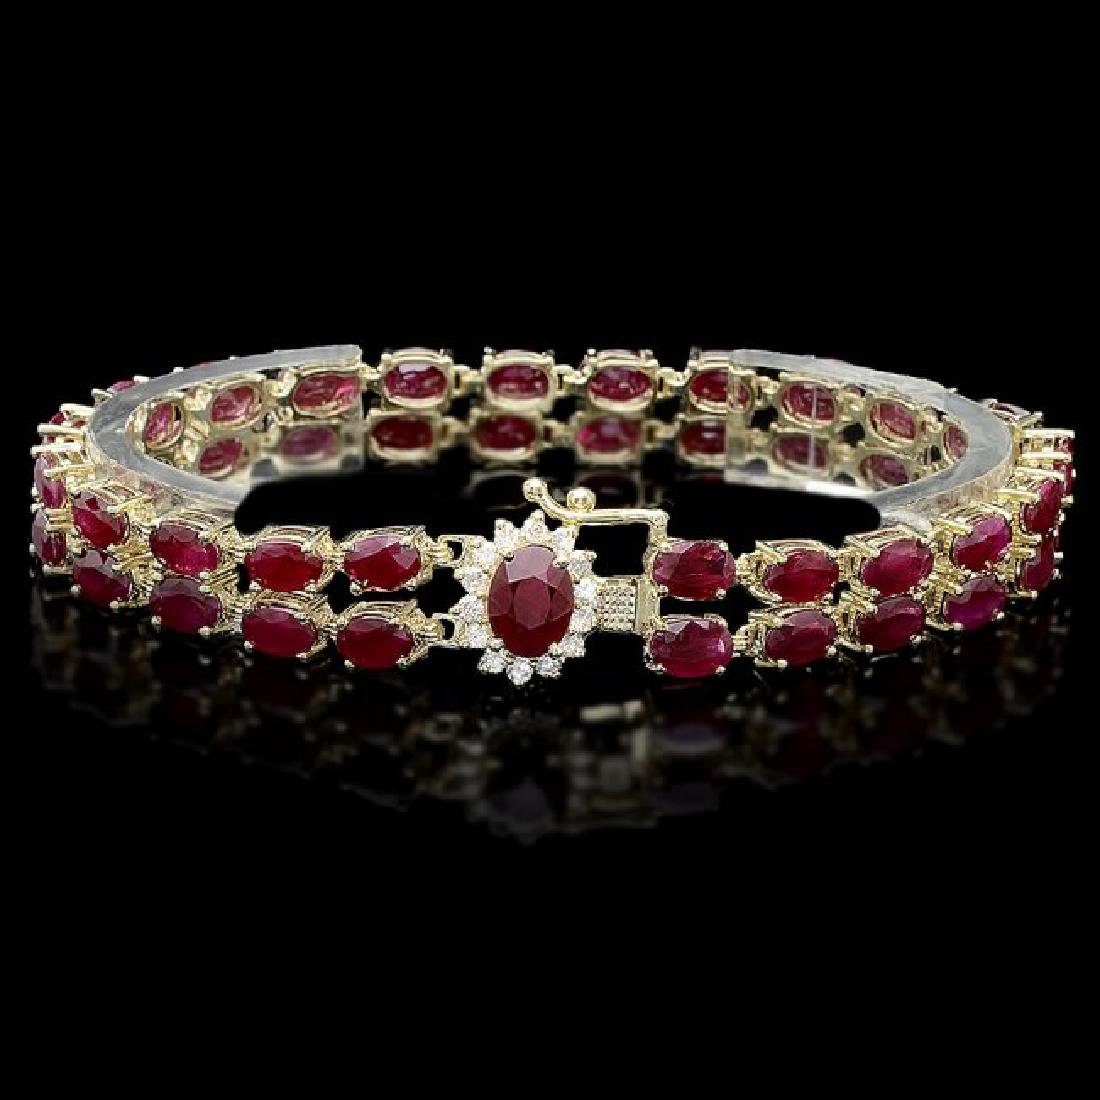 14k Gold 24.5ct Ruby 0.40ct Diamond Bracelet